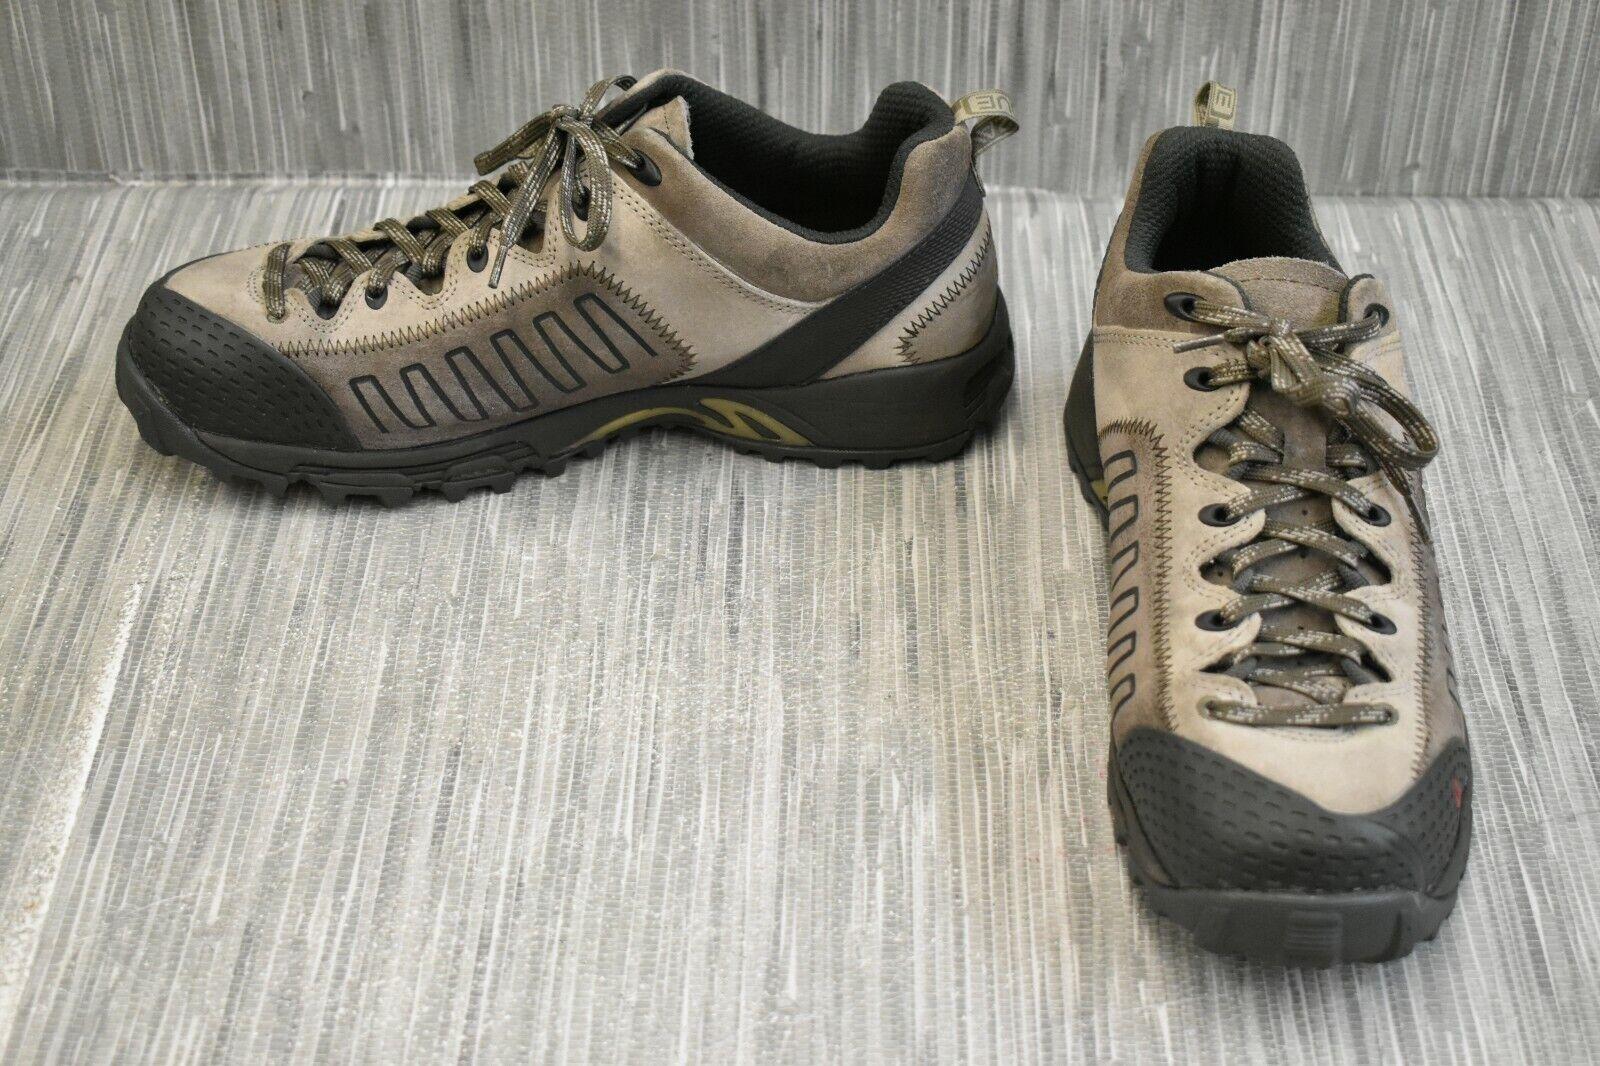 Vasque Juxt Hiking Shoe - Men's for